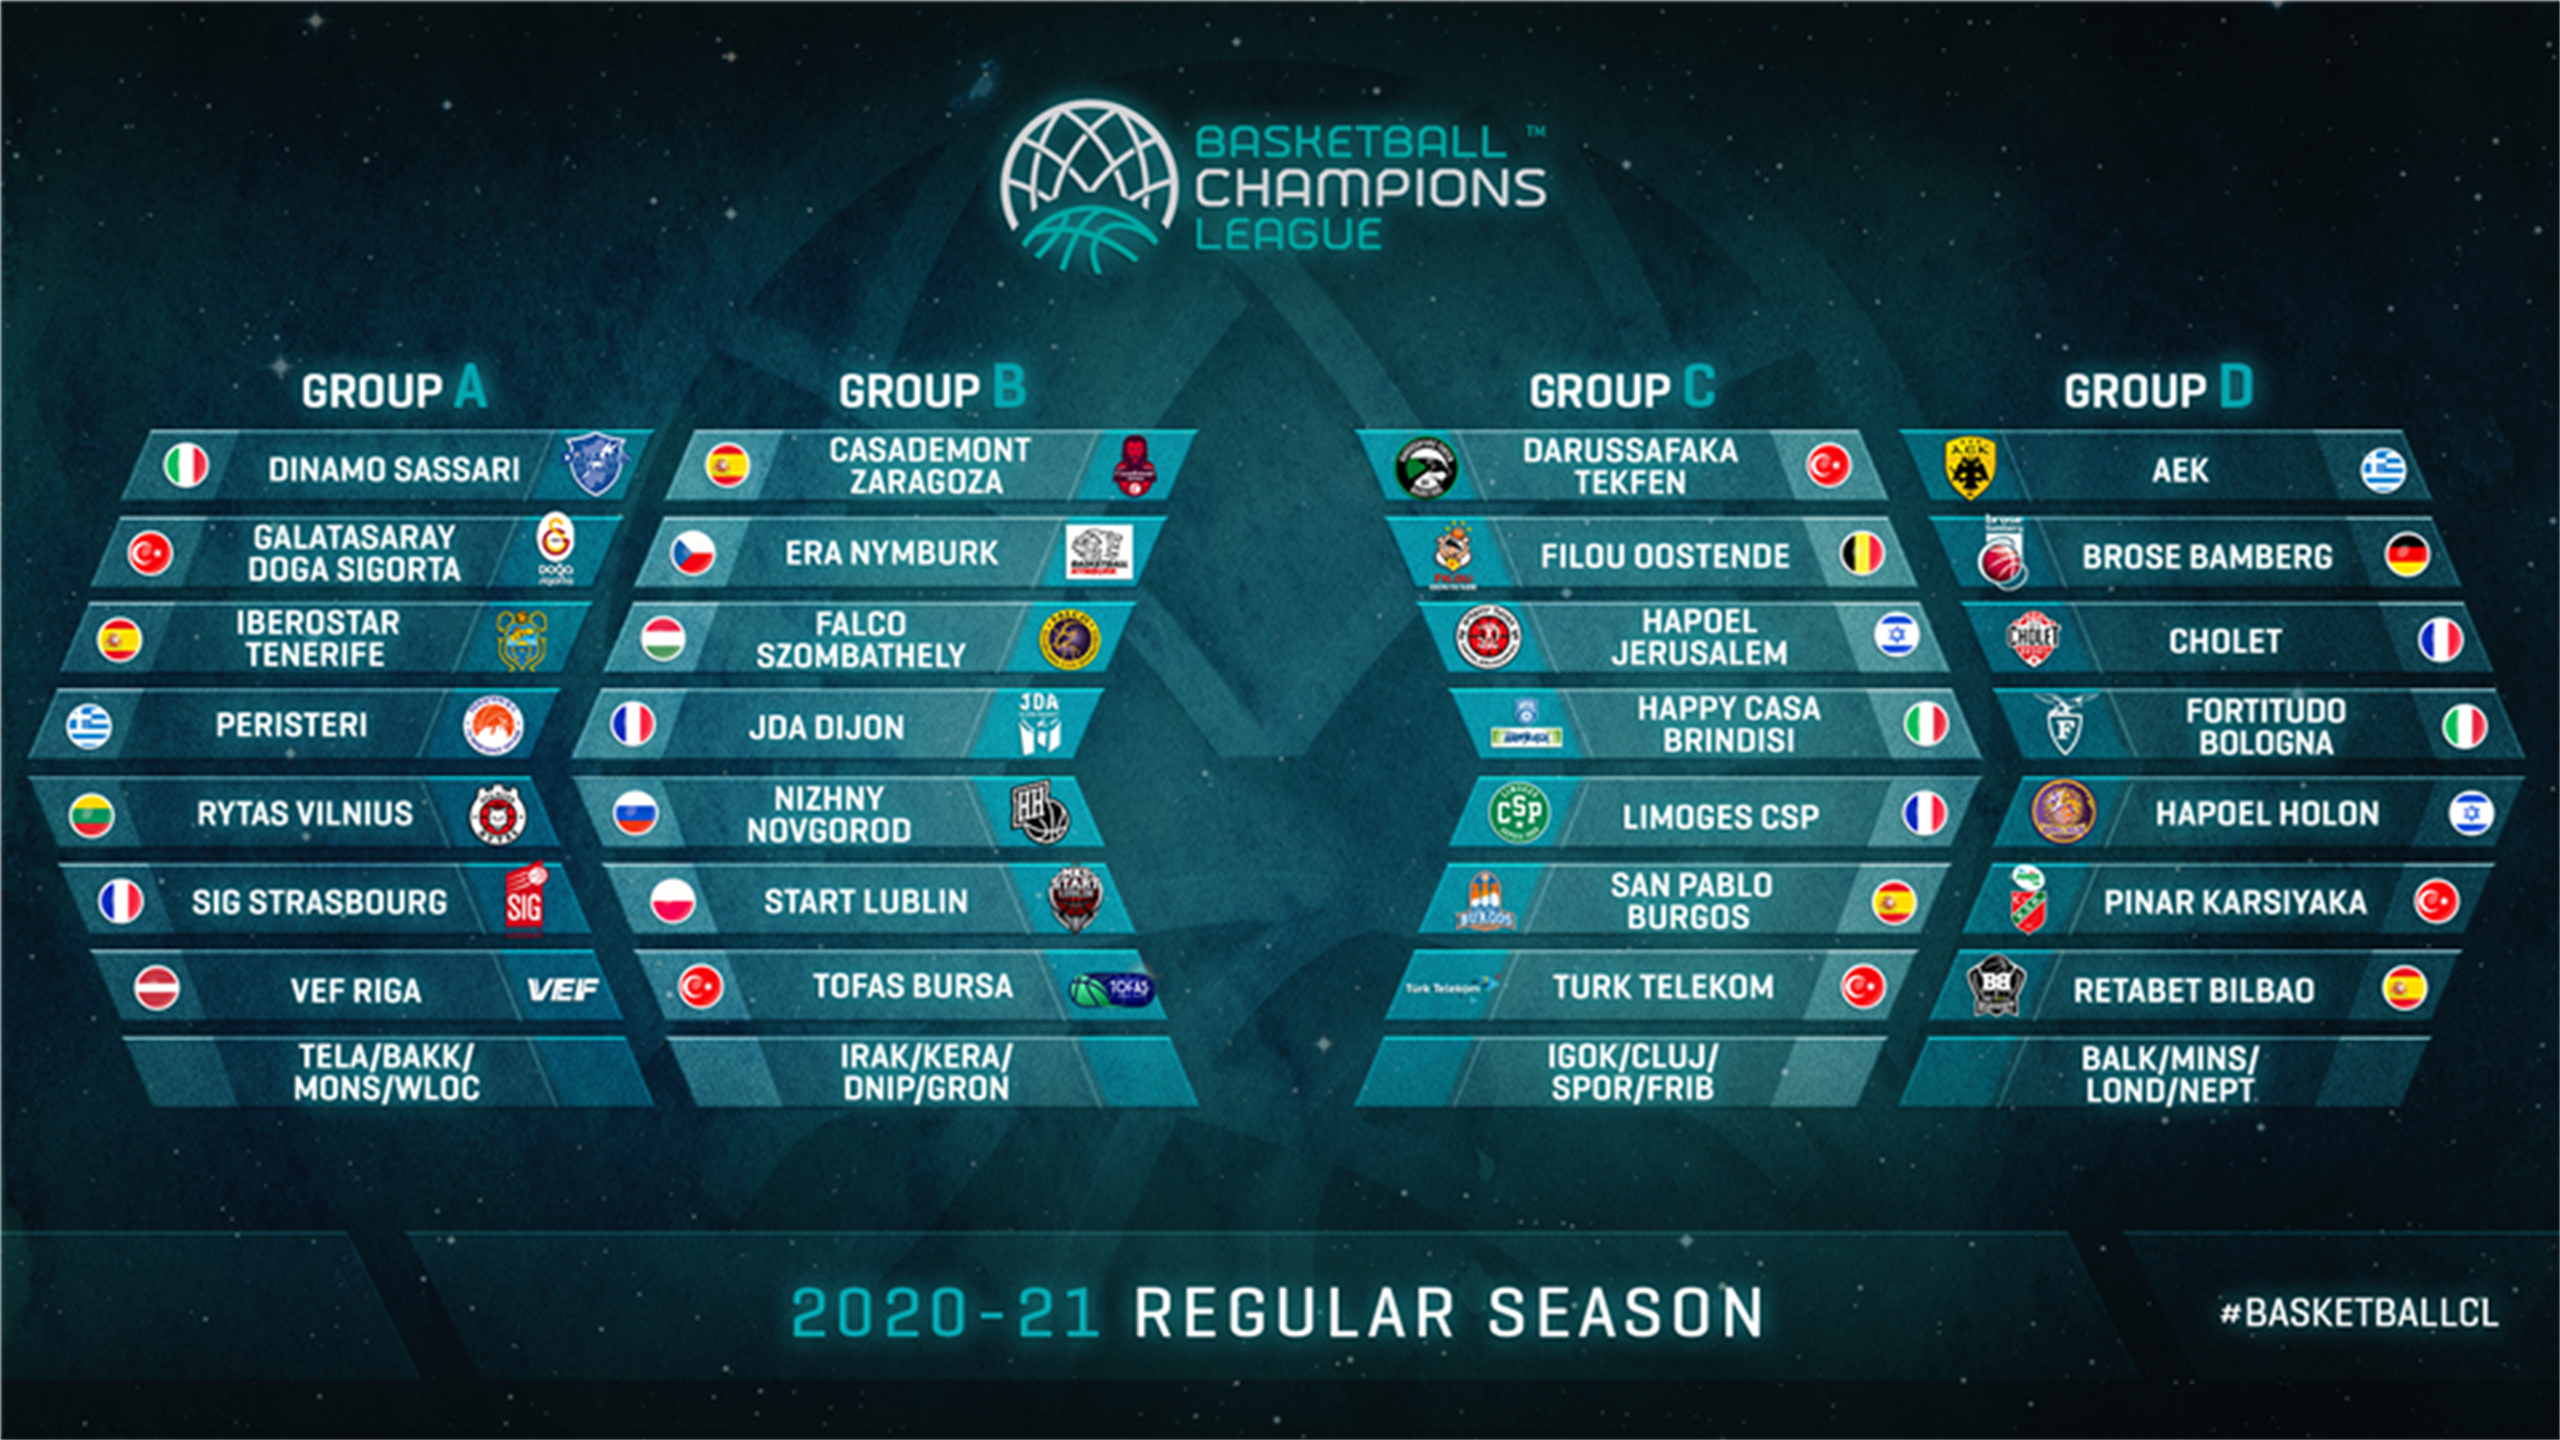 basket champions league 2020 2021 i gironi di sassari brindisi e fortitudo bologna eurosport basket champions league 2020 2021 i